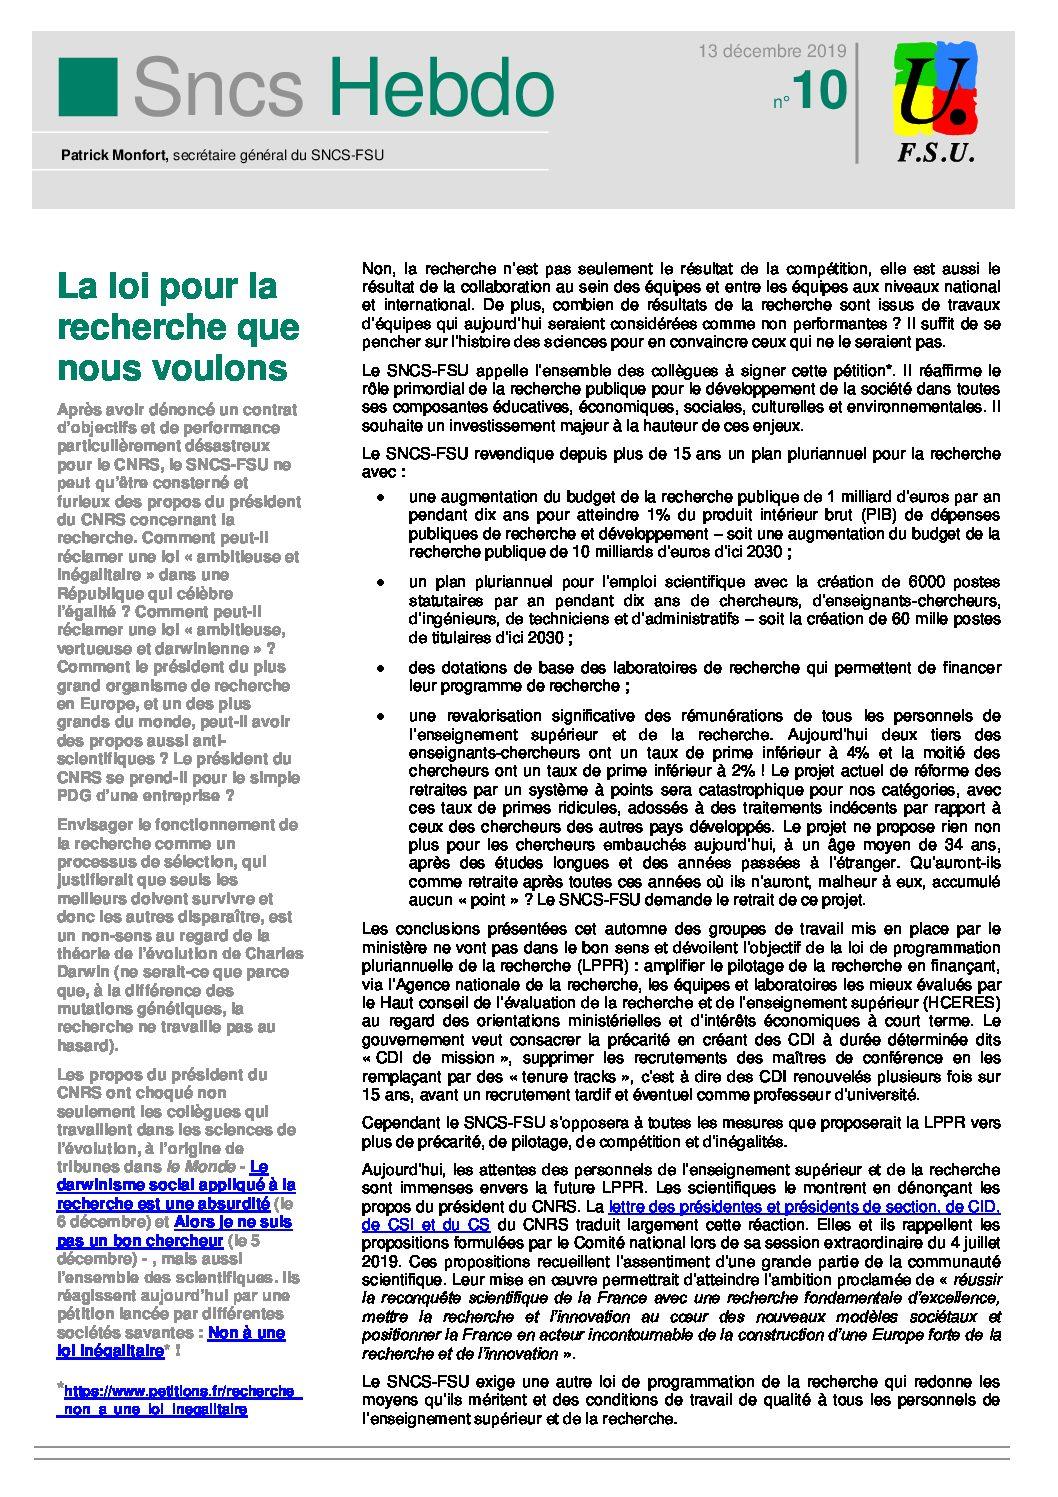 SNCSHebdo19N10-1-pdf.jpg